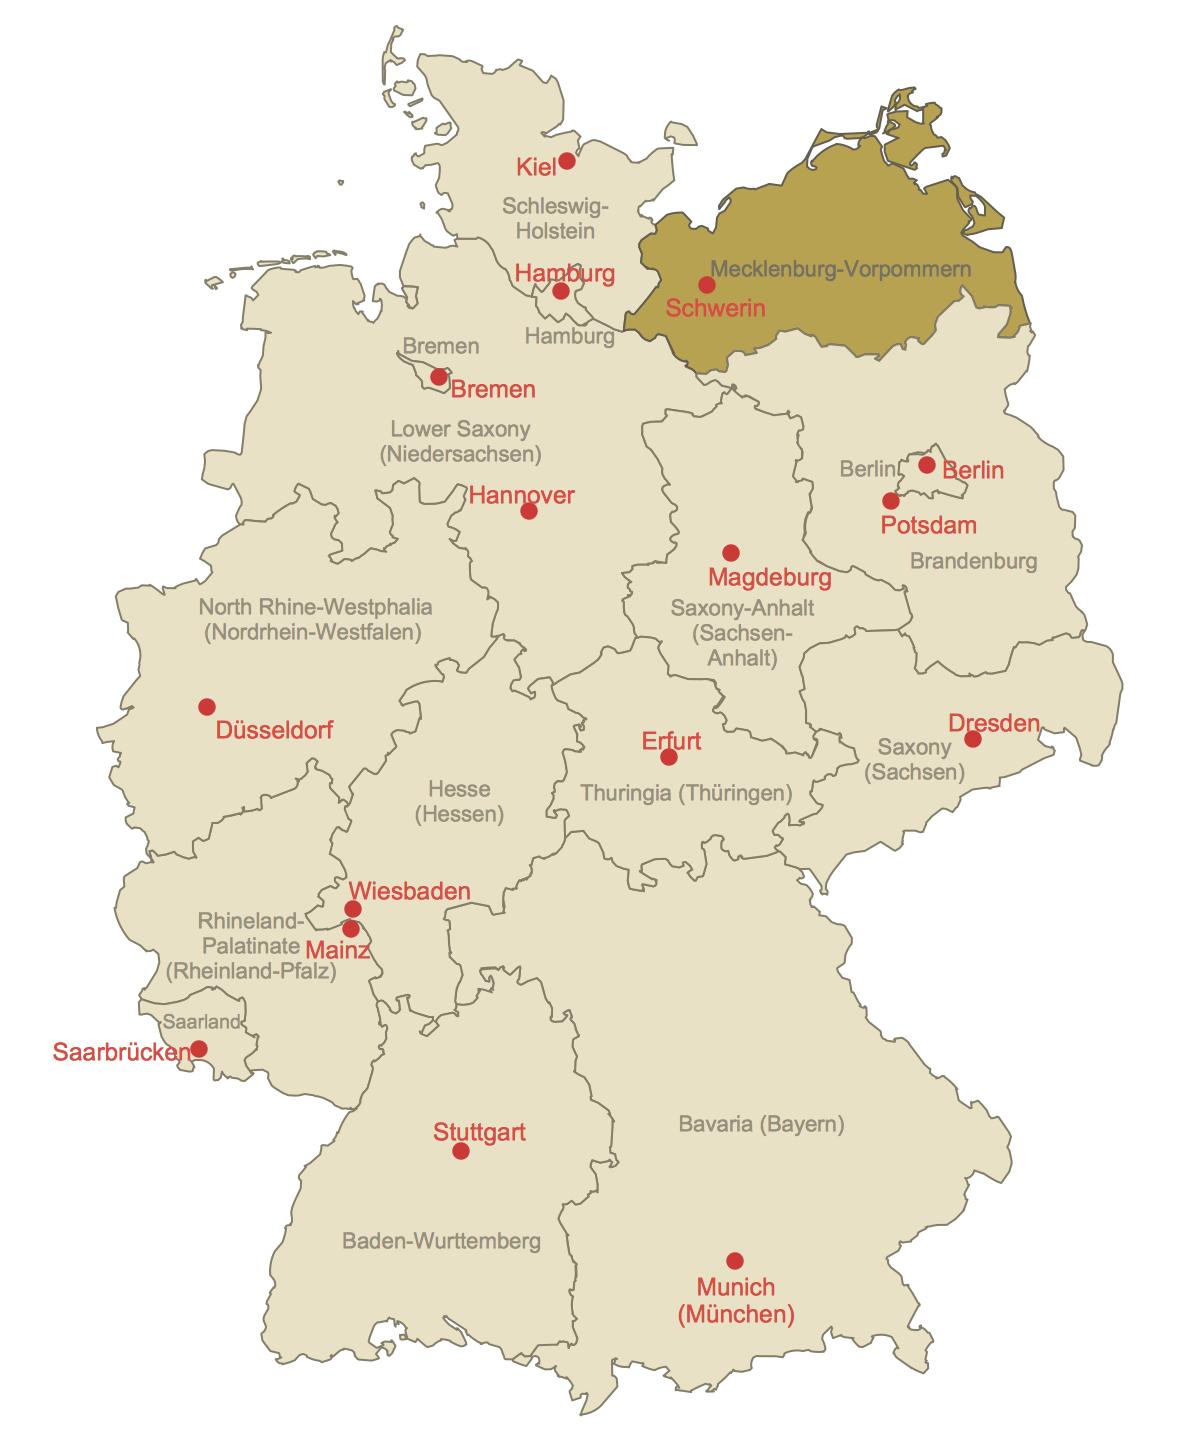 Locator Map of Mecklenburg-Vorpommern